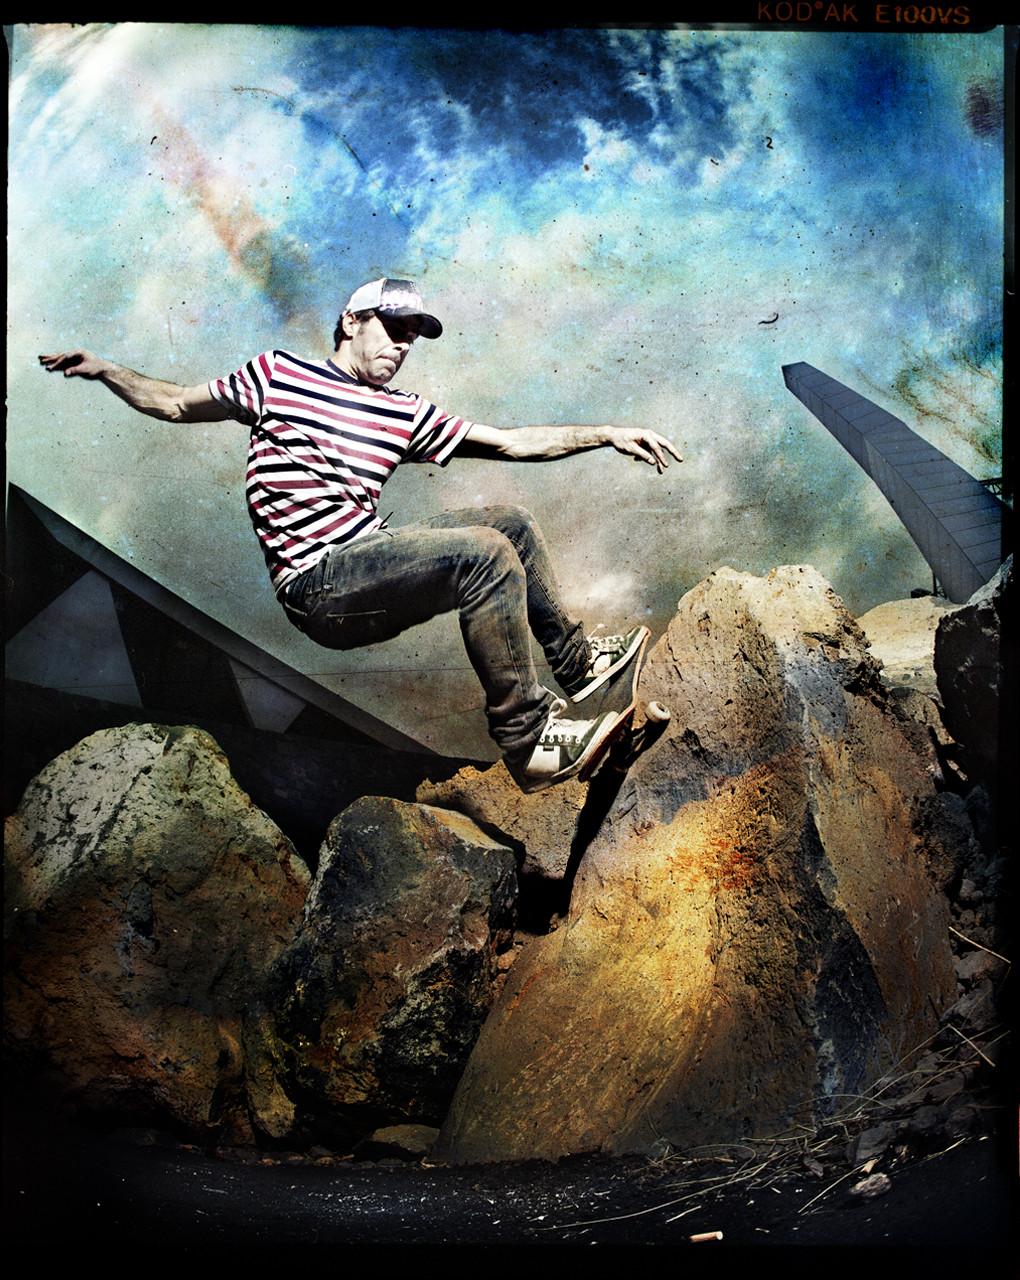 SKATE-STREET-PHOTOGRAPHY-07-JUANMI-MARQUEZ-1761x1280-1761x1280